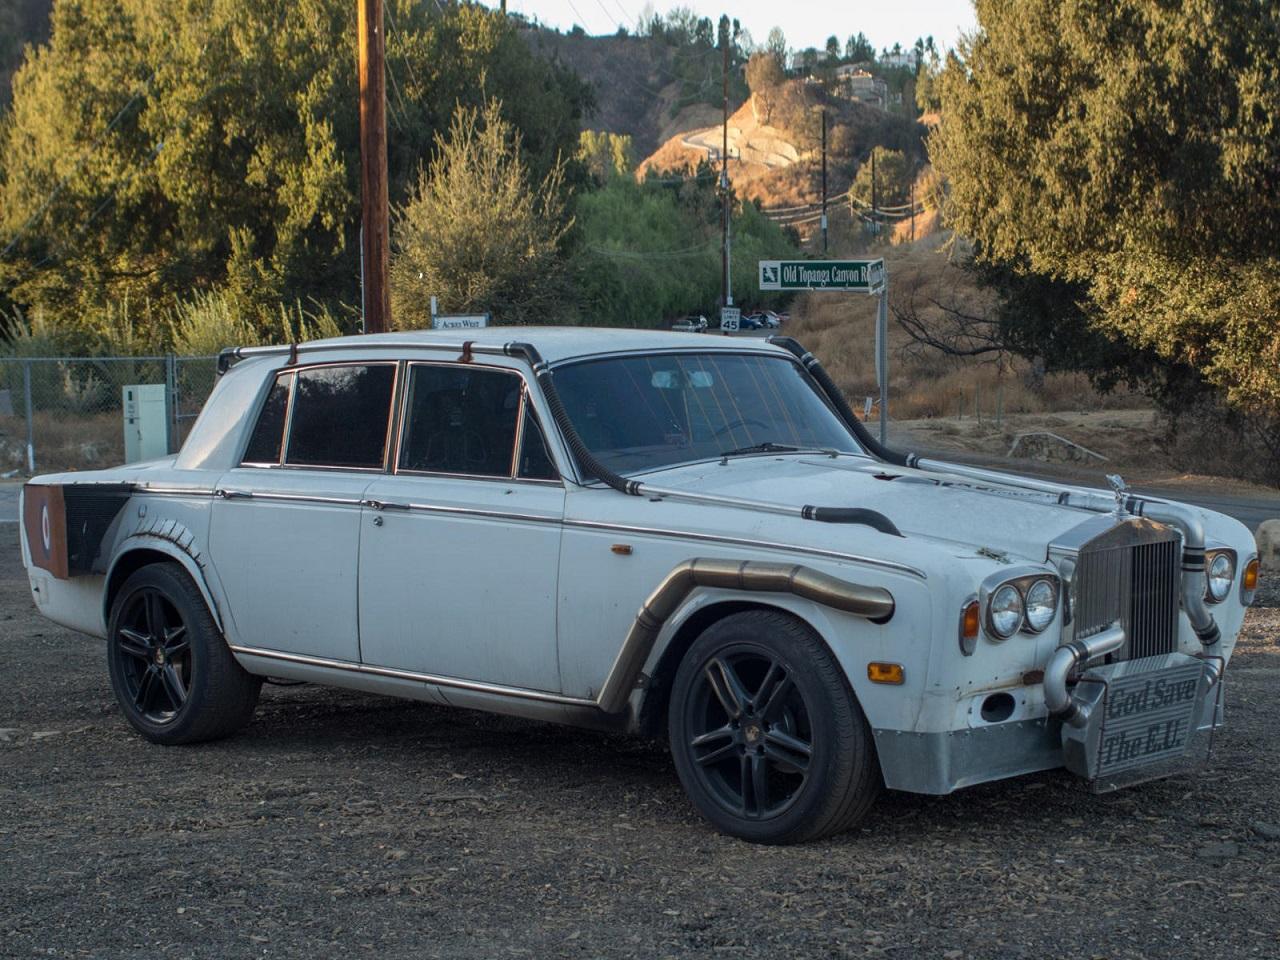 Rolls Royce Silver Shadow - The Trolls Royce ! 3